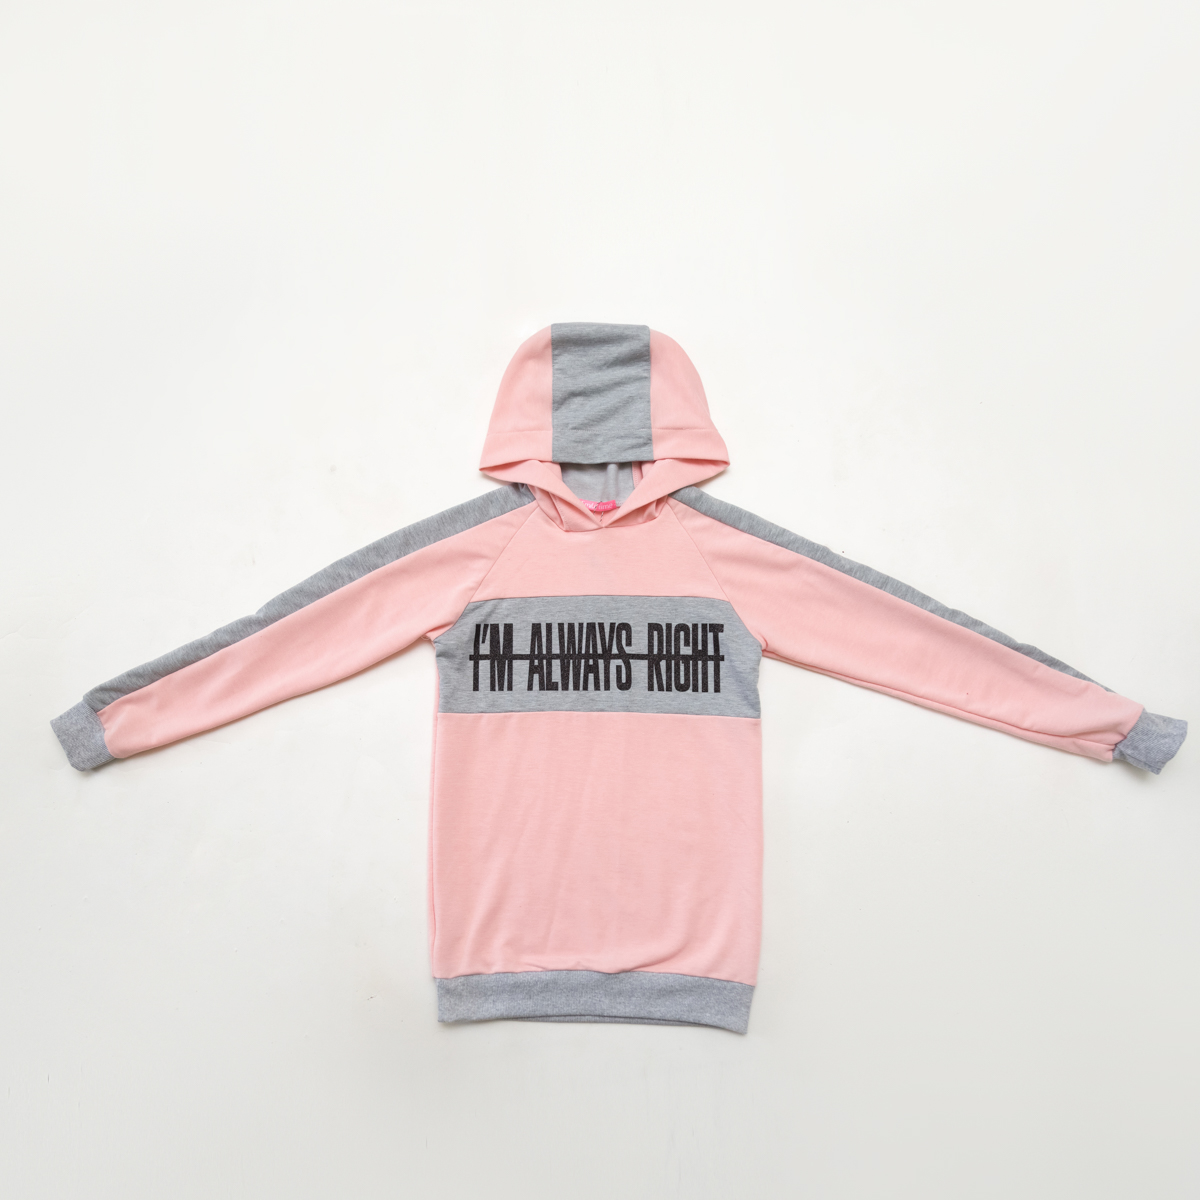 Худи для девочки SmileTime Fashion, розовая с серым